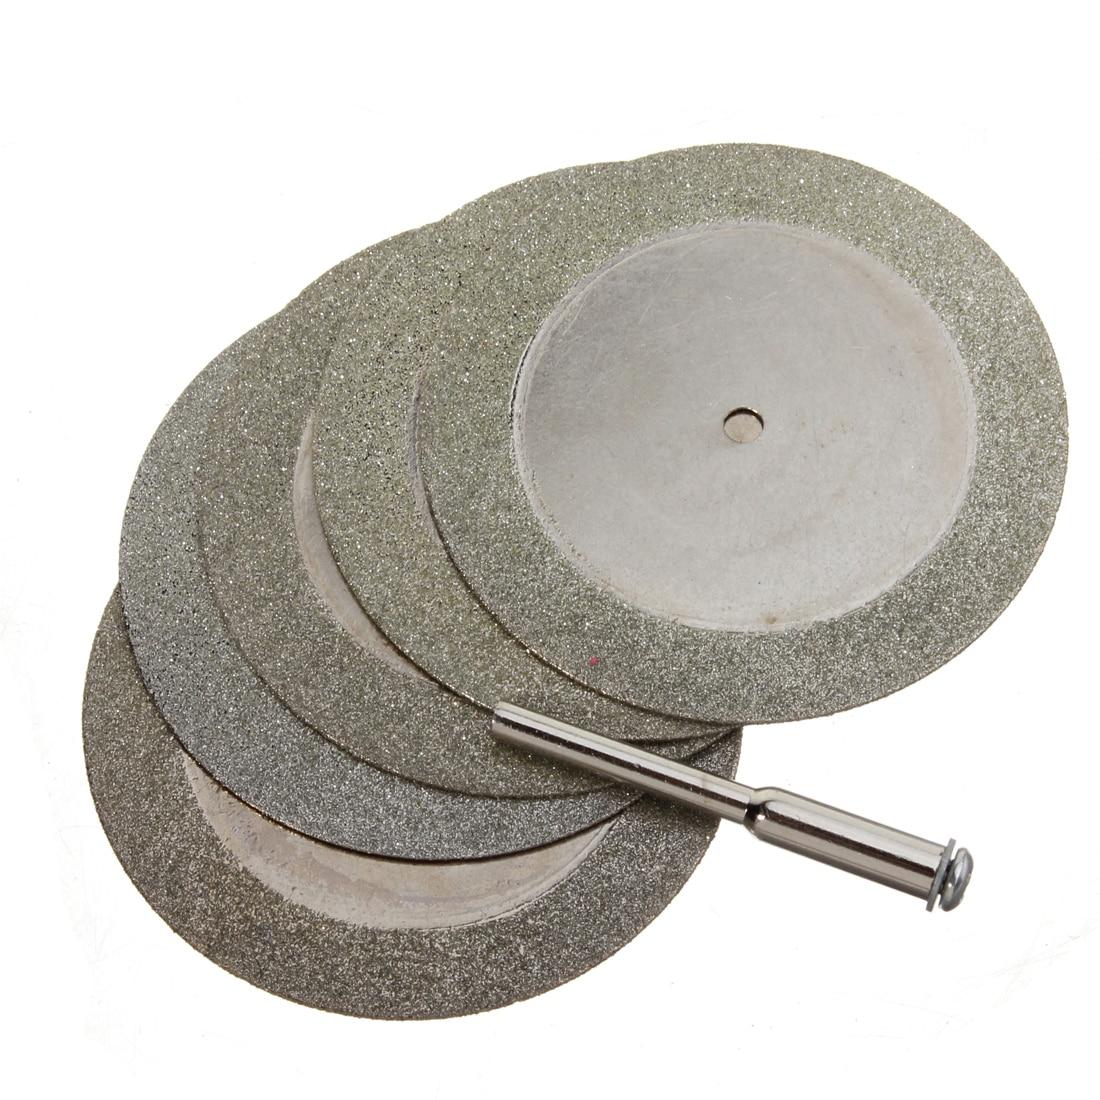 6pcs 50mm Diamond Cutting Discs Wheel & Drill Bit For Rotary Dremel Tool Saw Blade